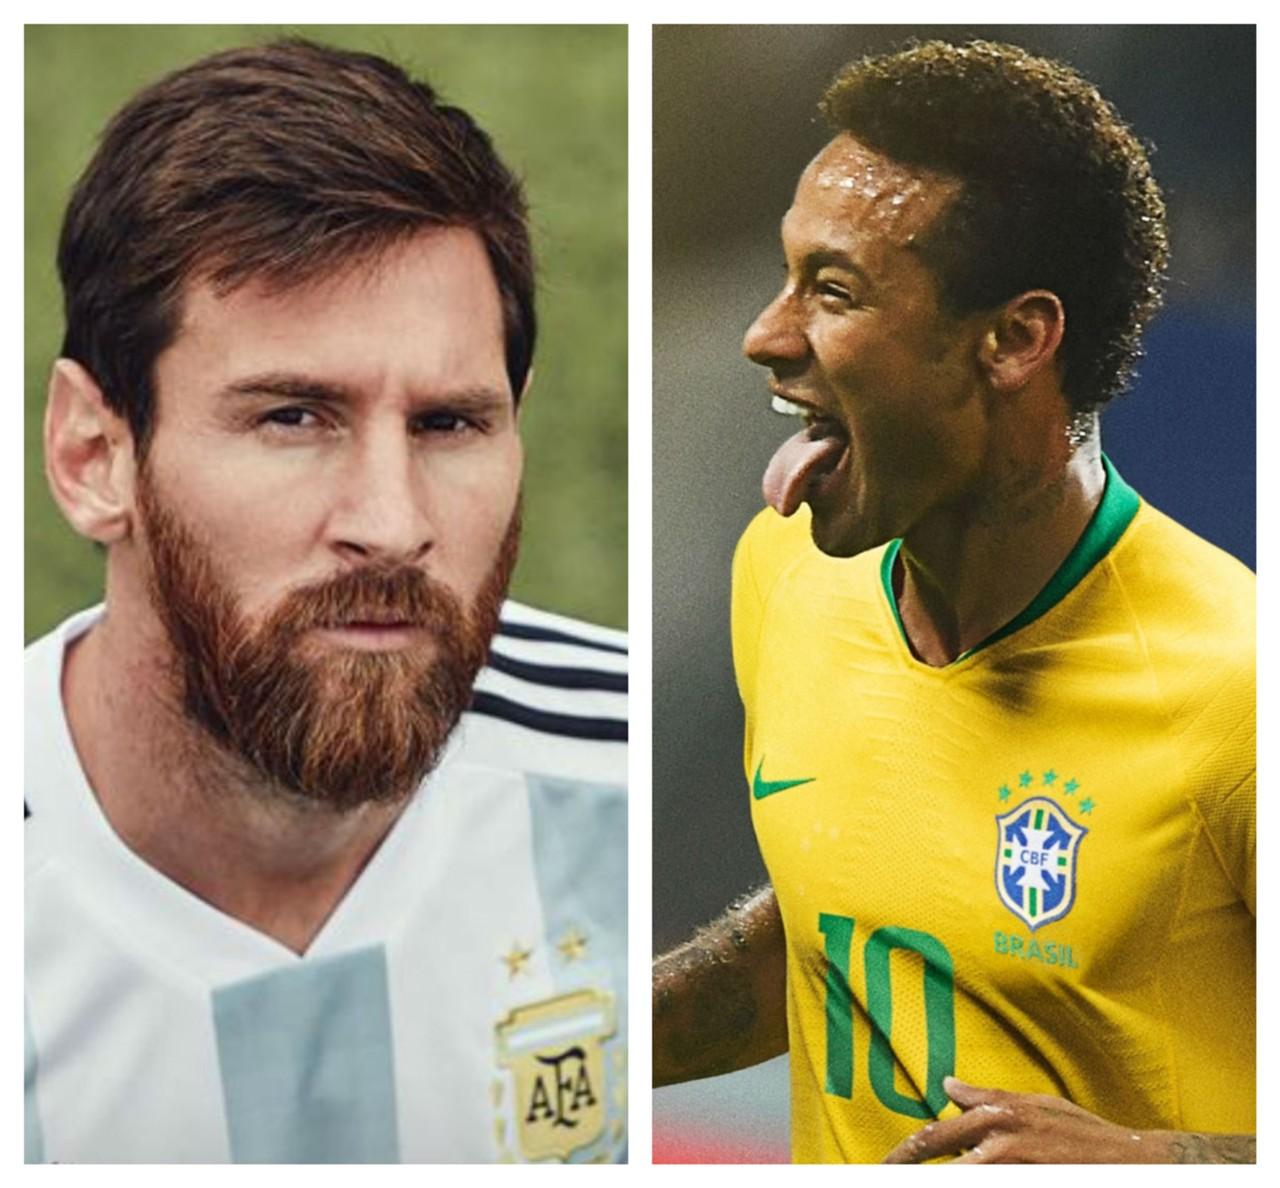 Neymar needs to mature to reach Messi levels - Xavi